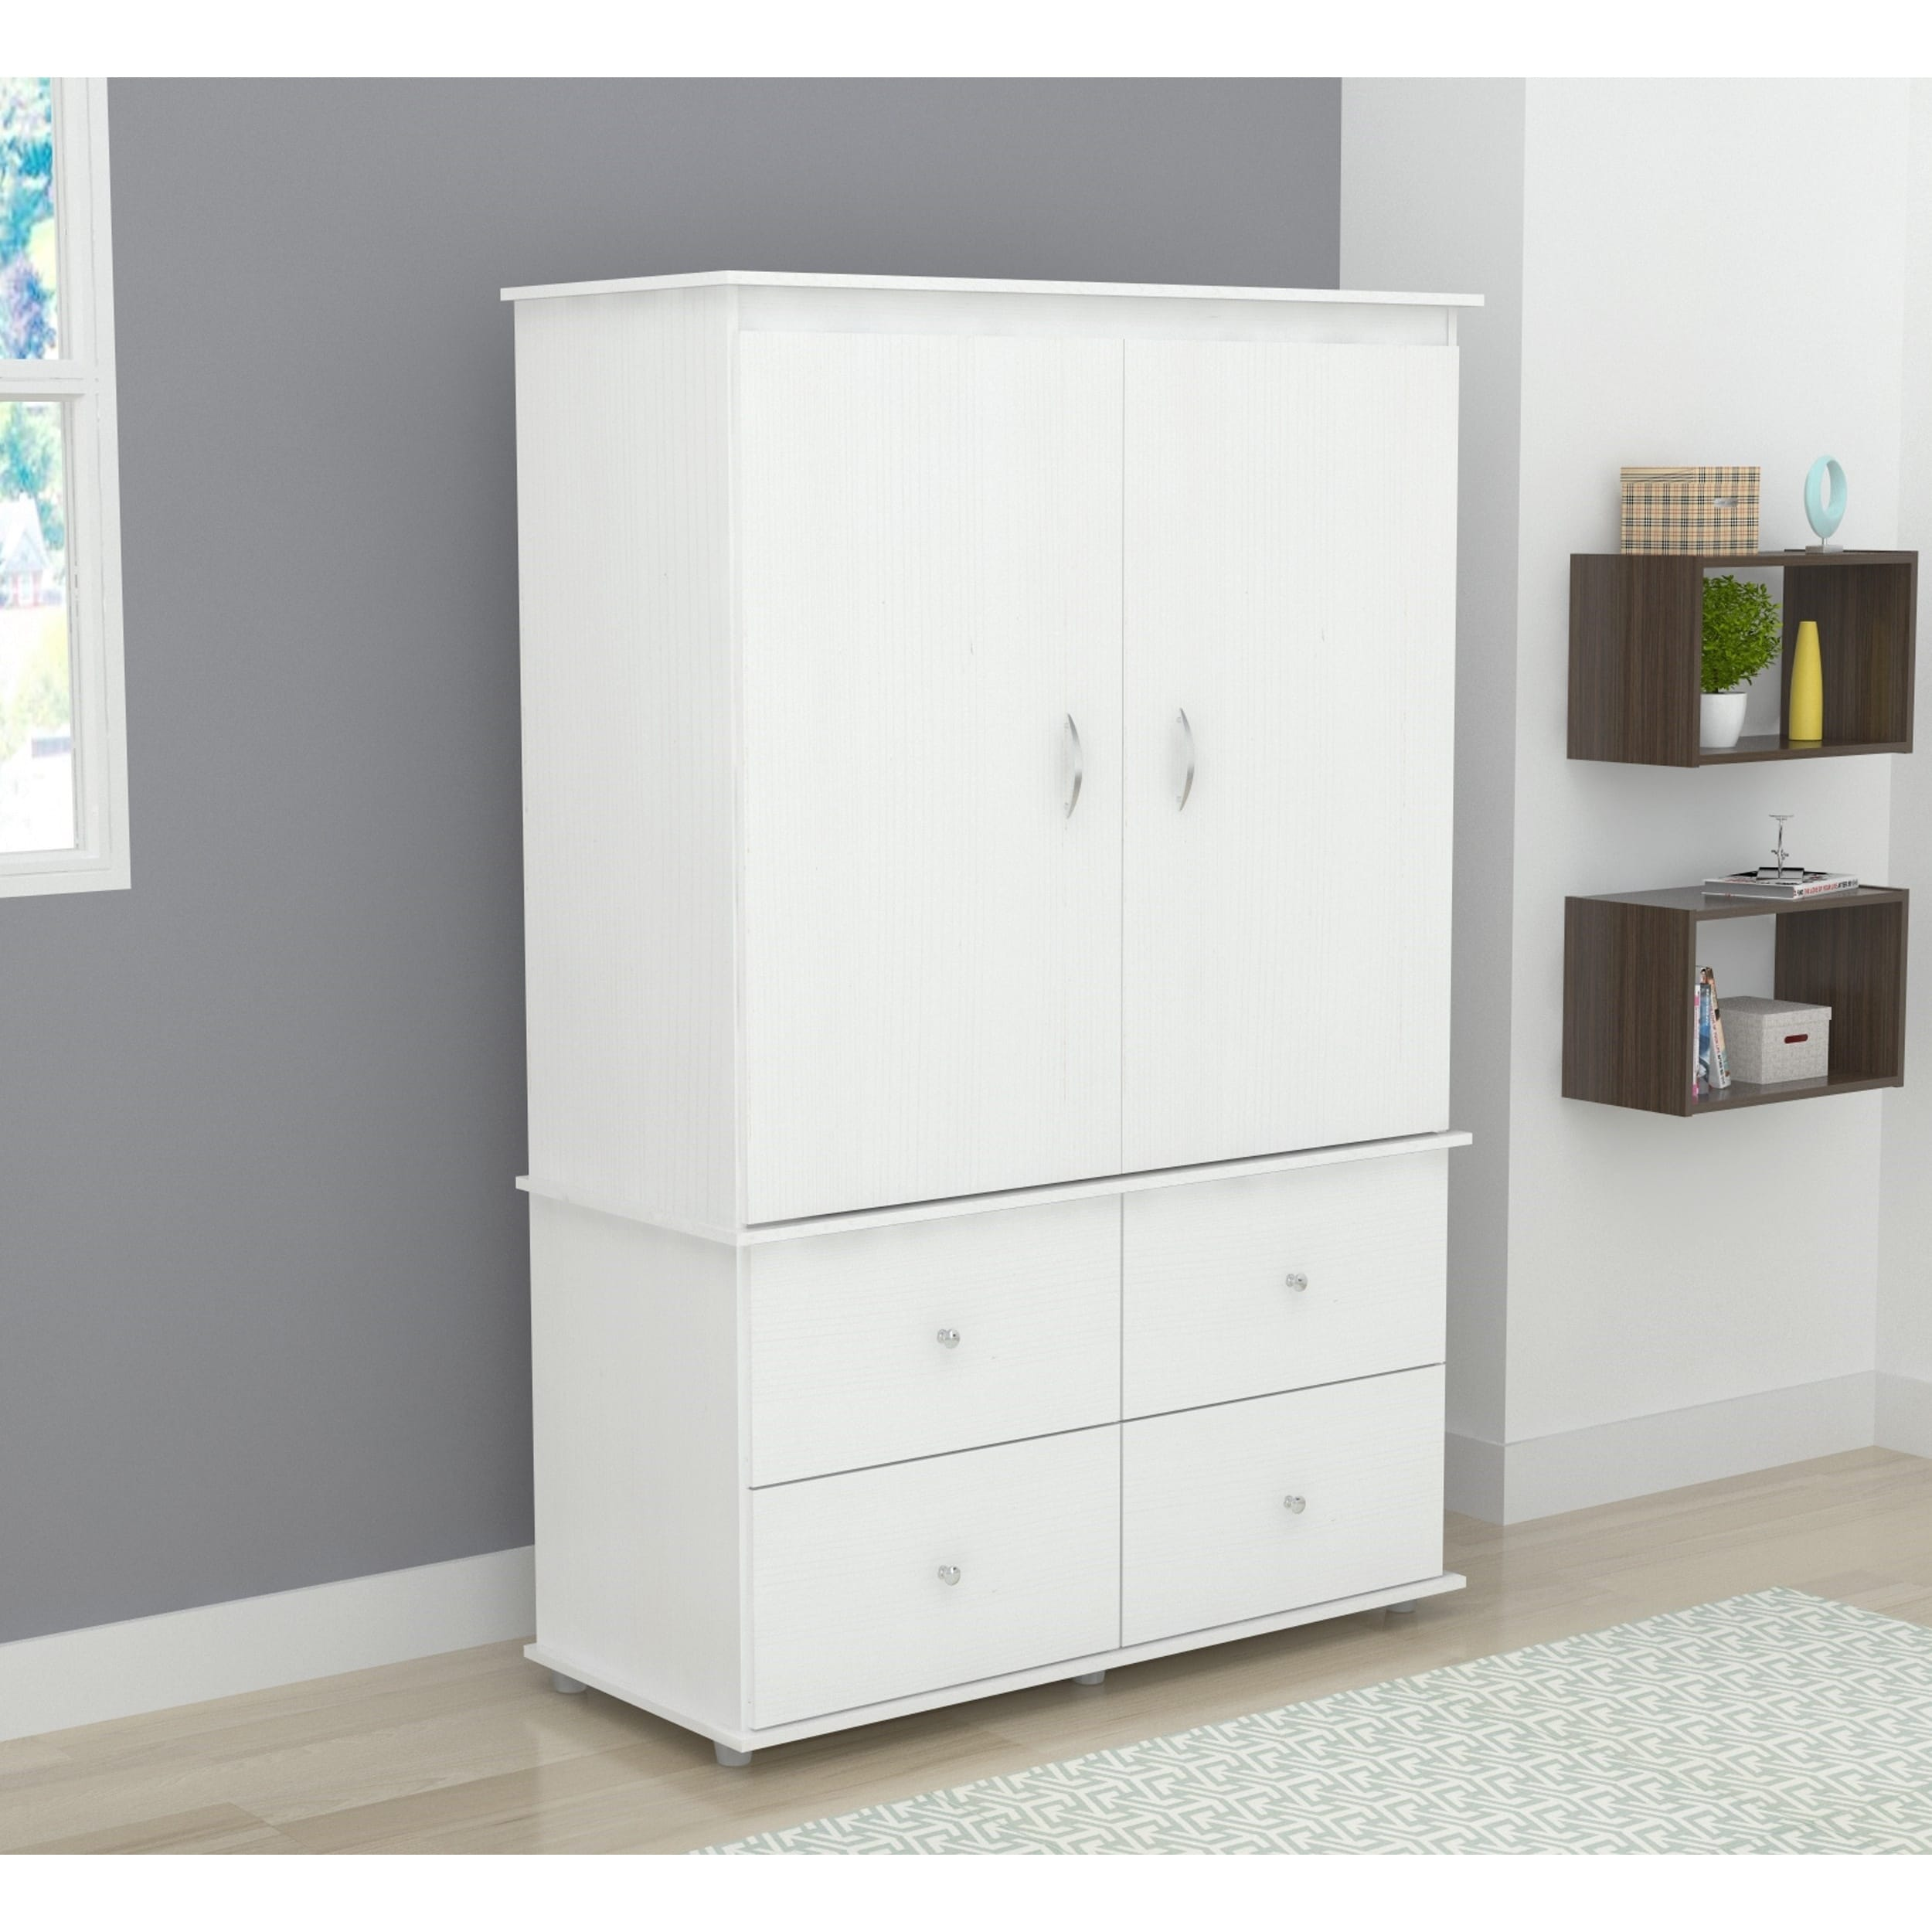 Clay Alder Home Aurora White Audio Video Armoire Cabinet